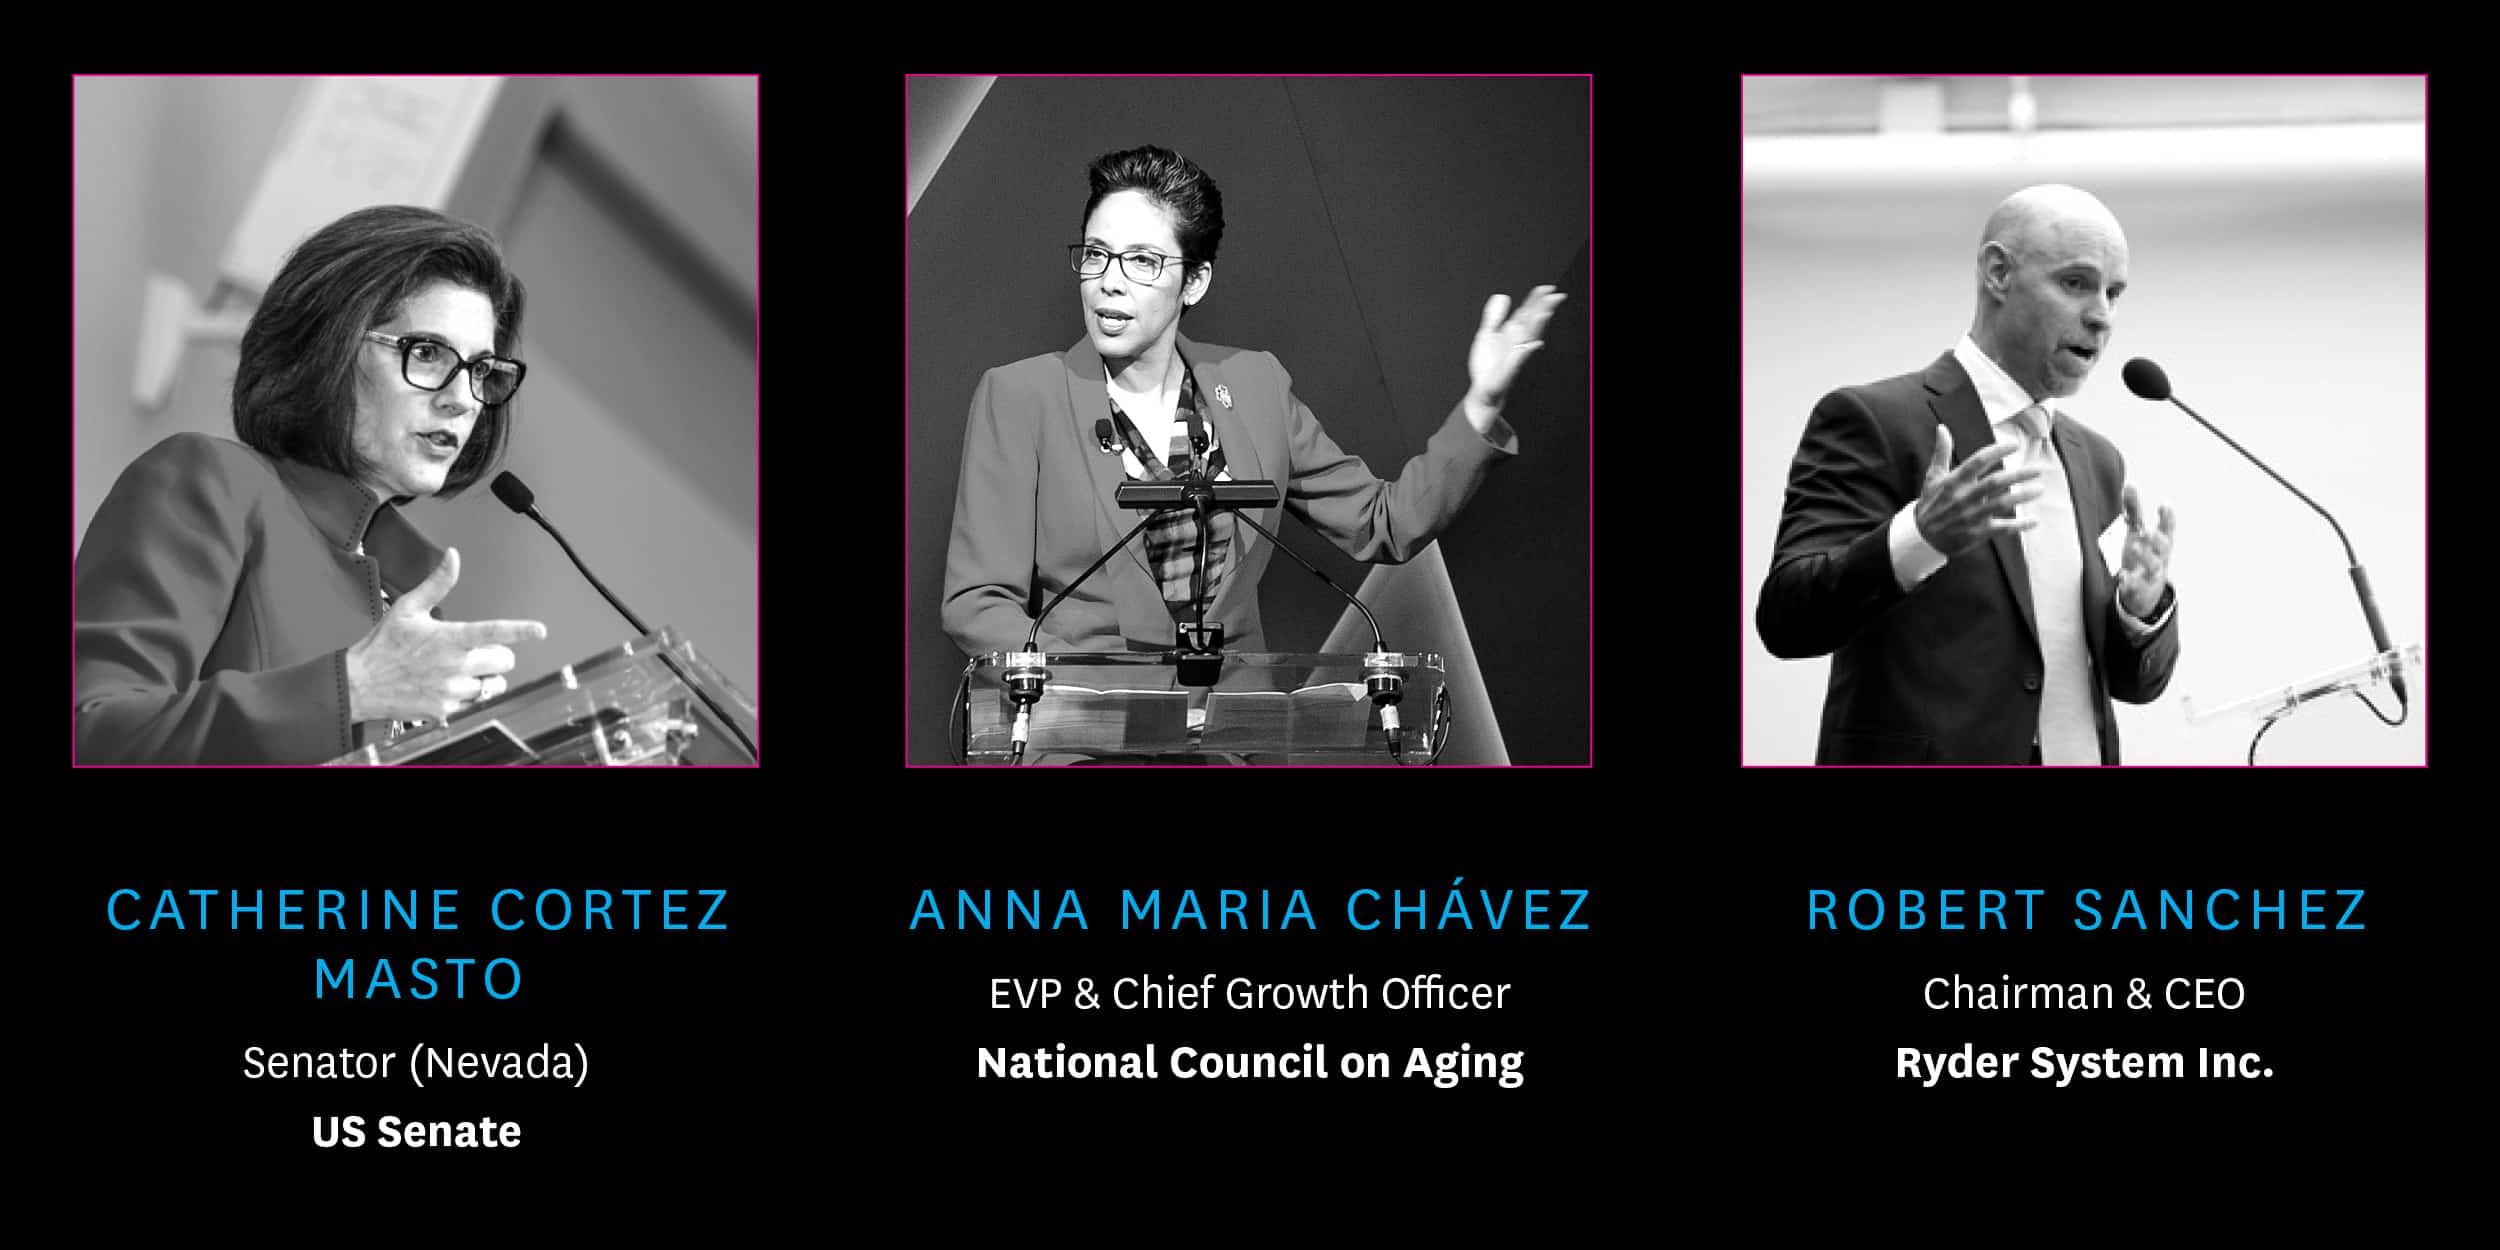 Past Speakers Senator Catherine Cortez Masto, Anna Maria Chavez, and Robert Sanchez